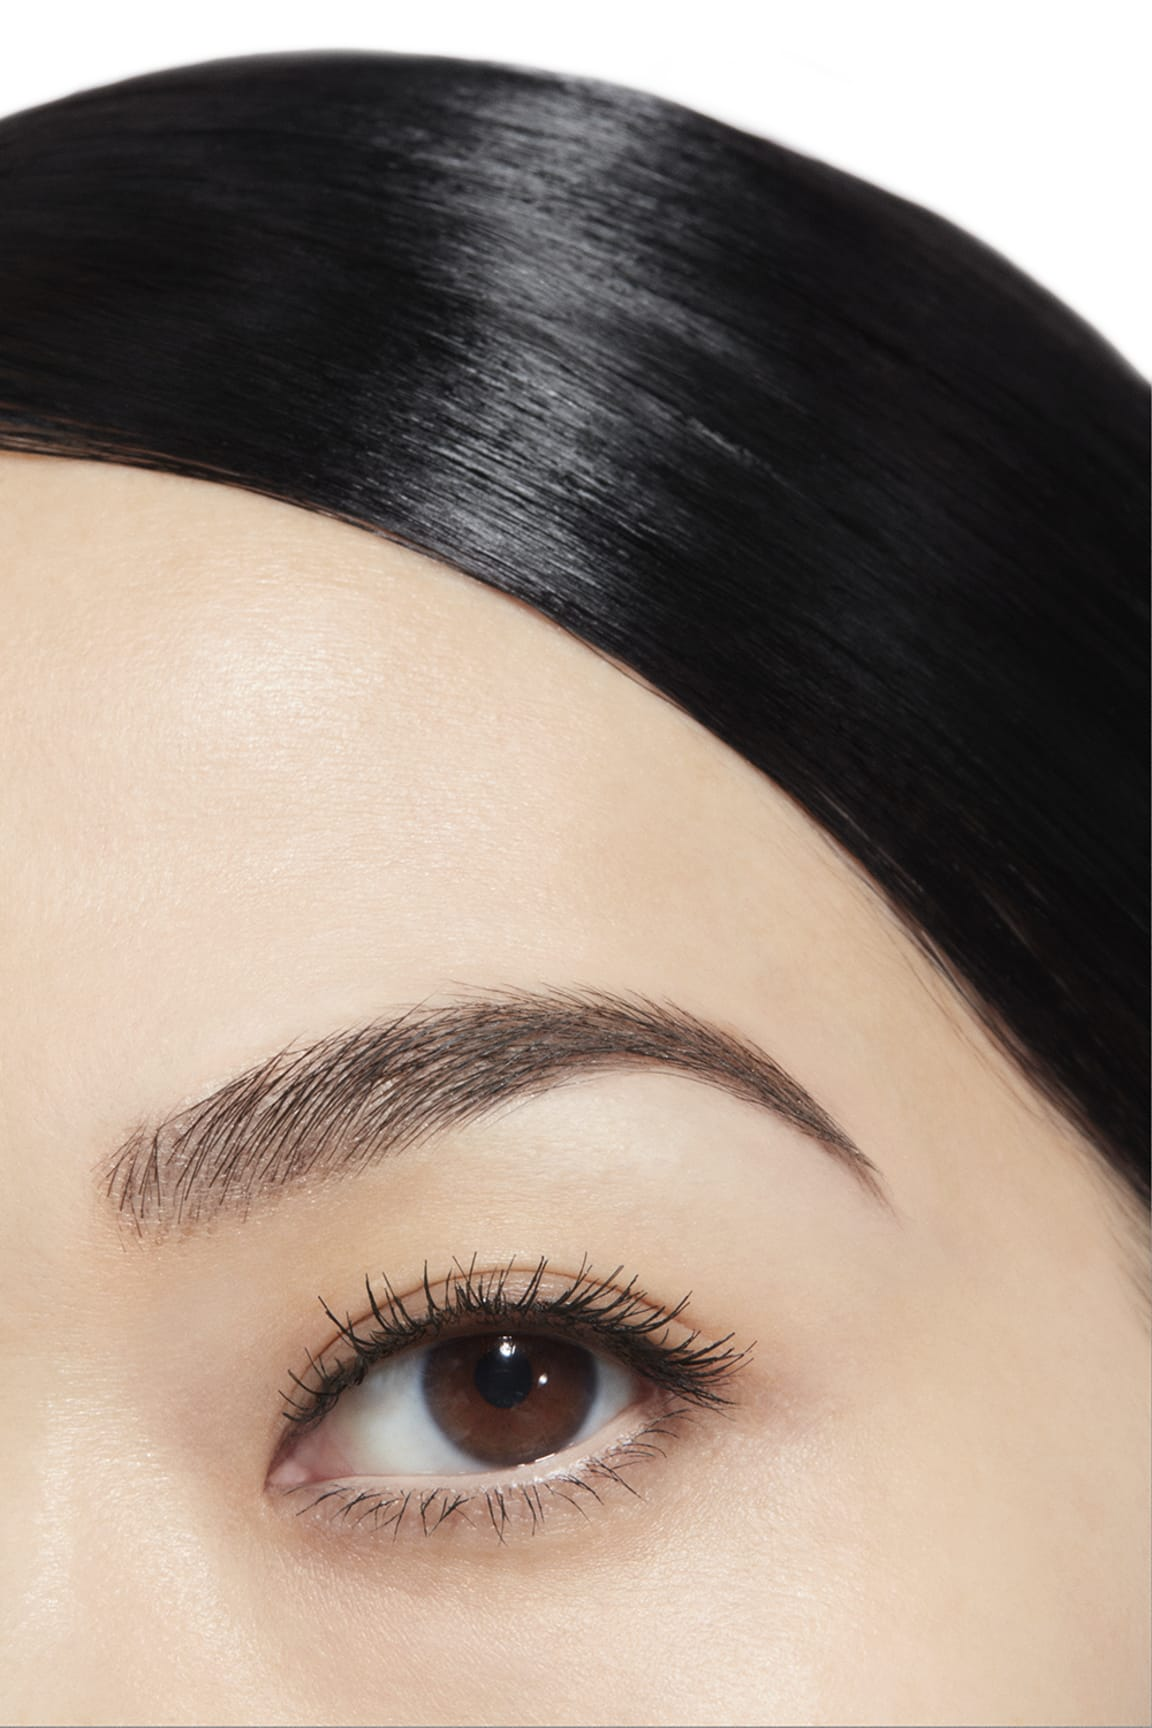 Application makeup visual 1 - LE CRAYON KHÔL 69 - CLAIR